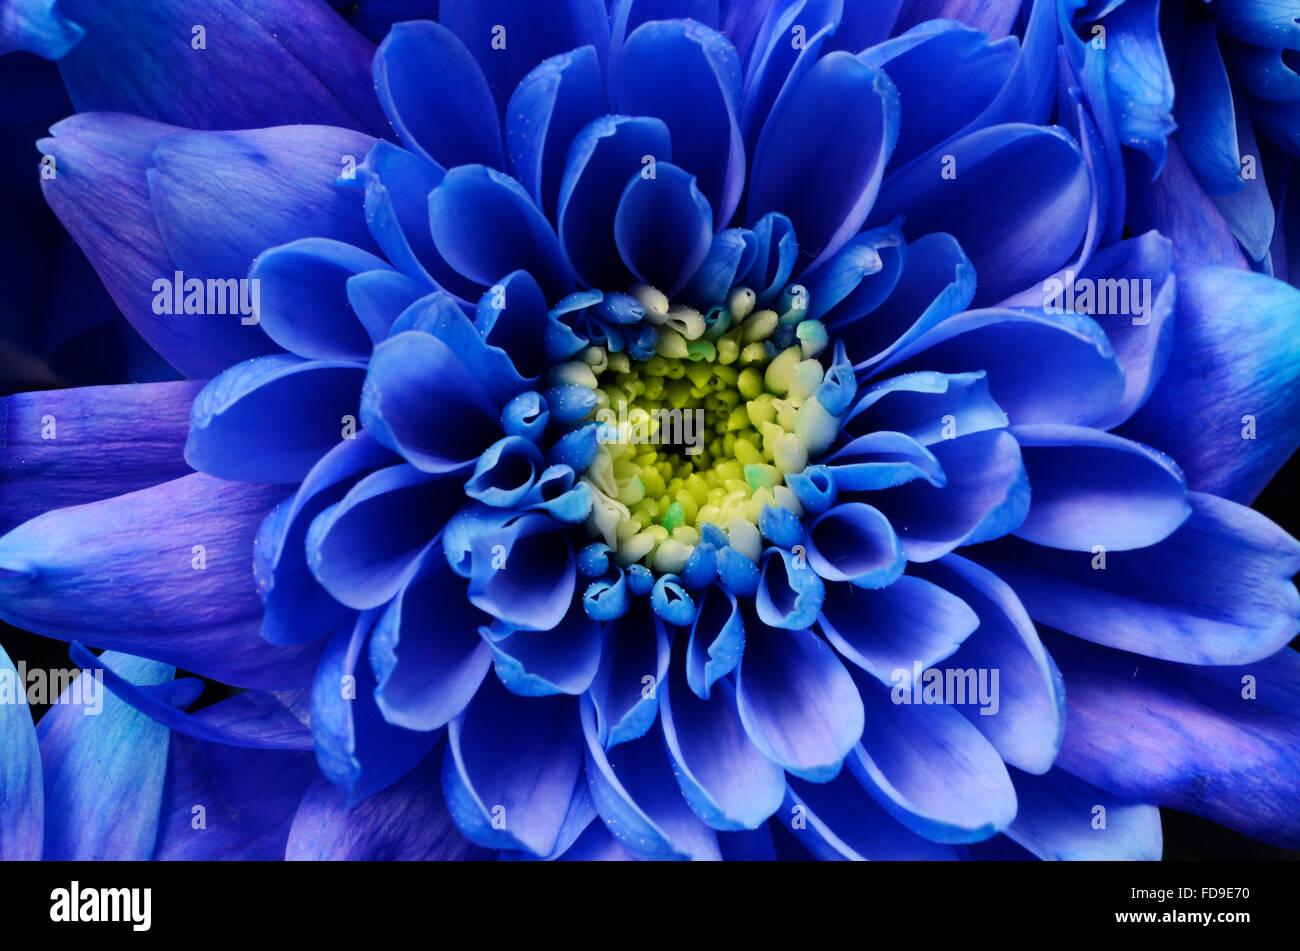 Macro Of Blue Aster Flower Petals Stock Photo 94251108 Alamy